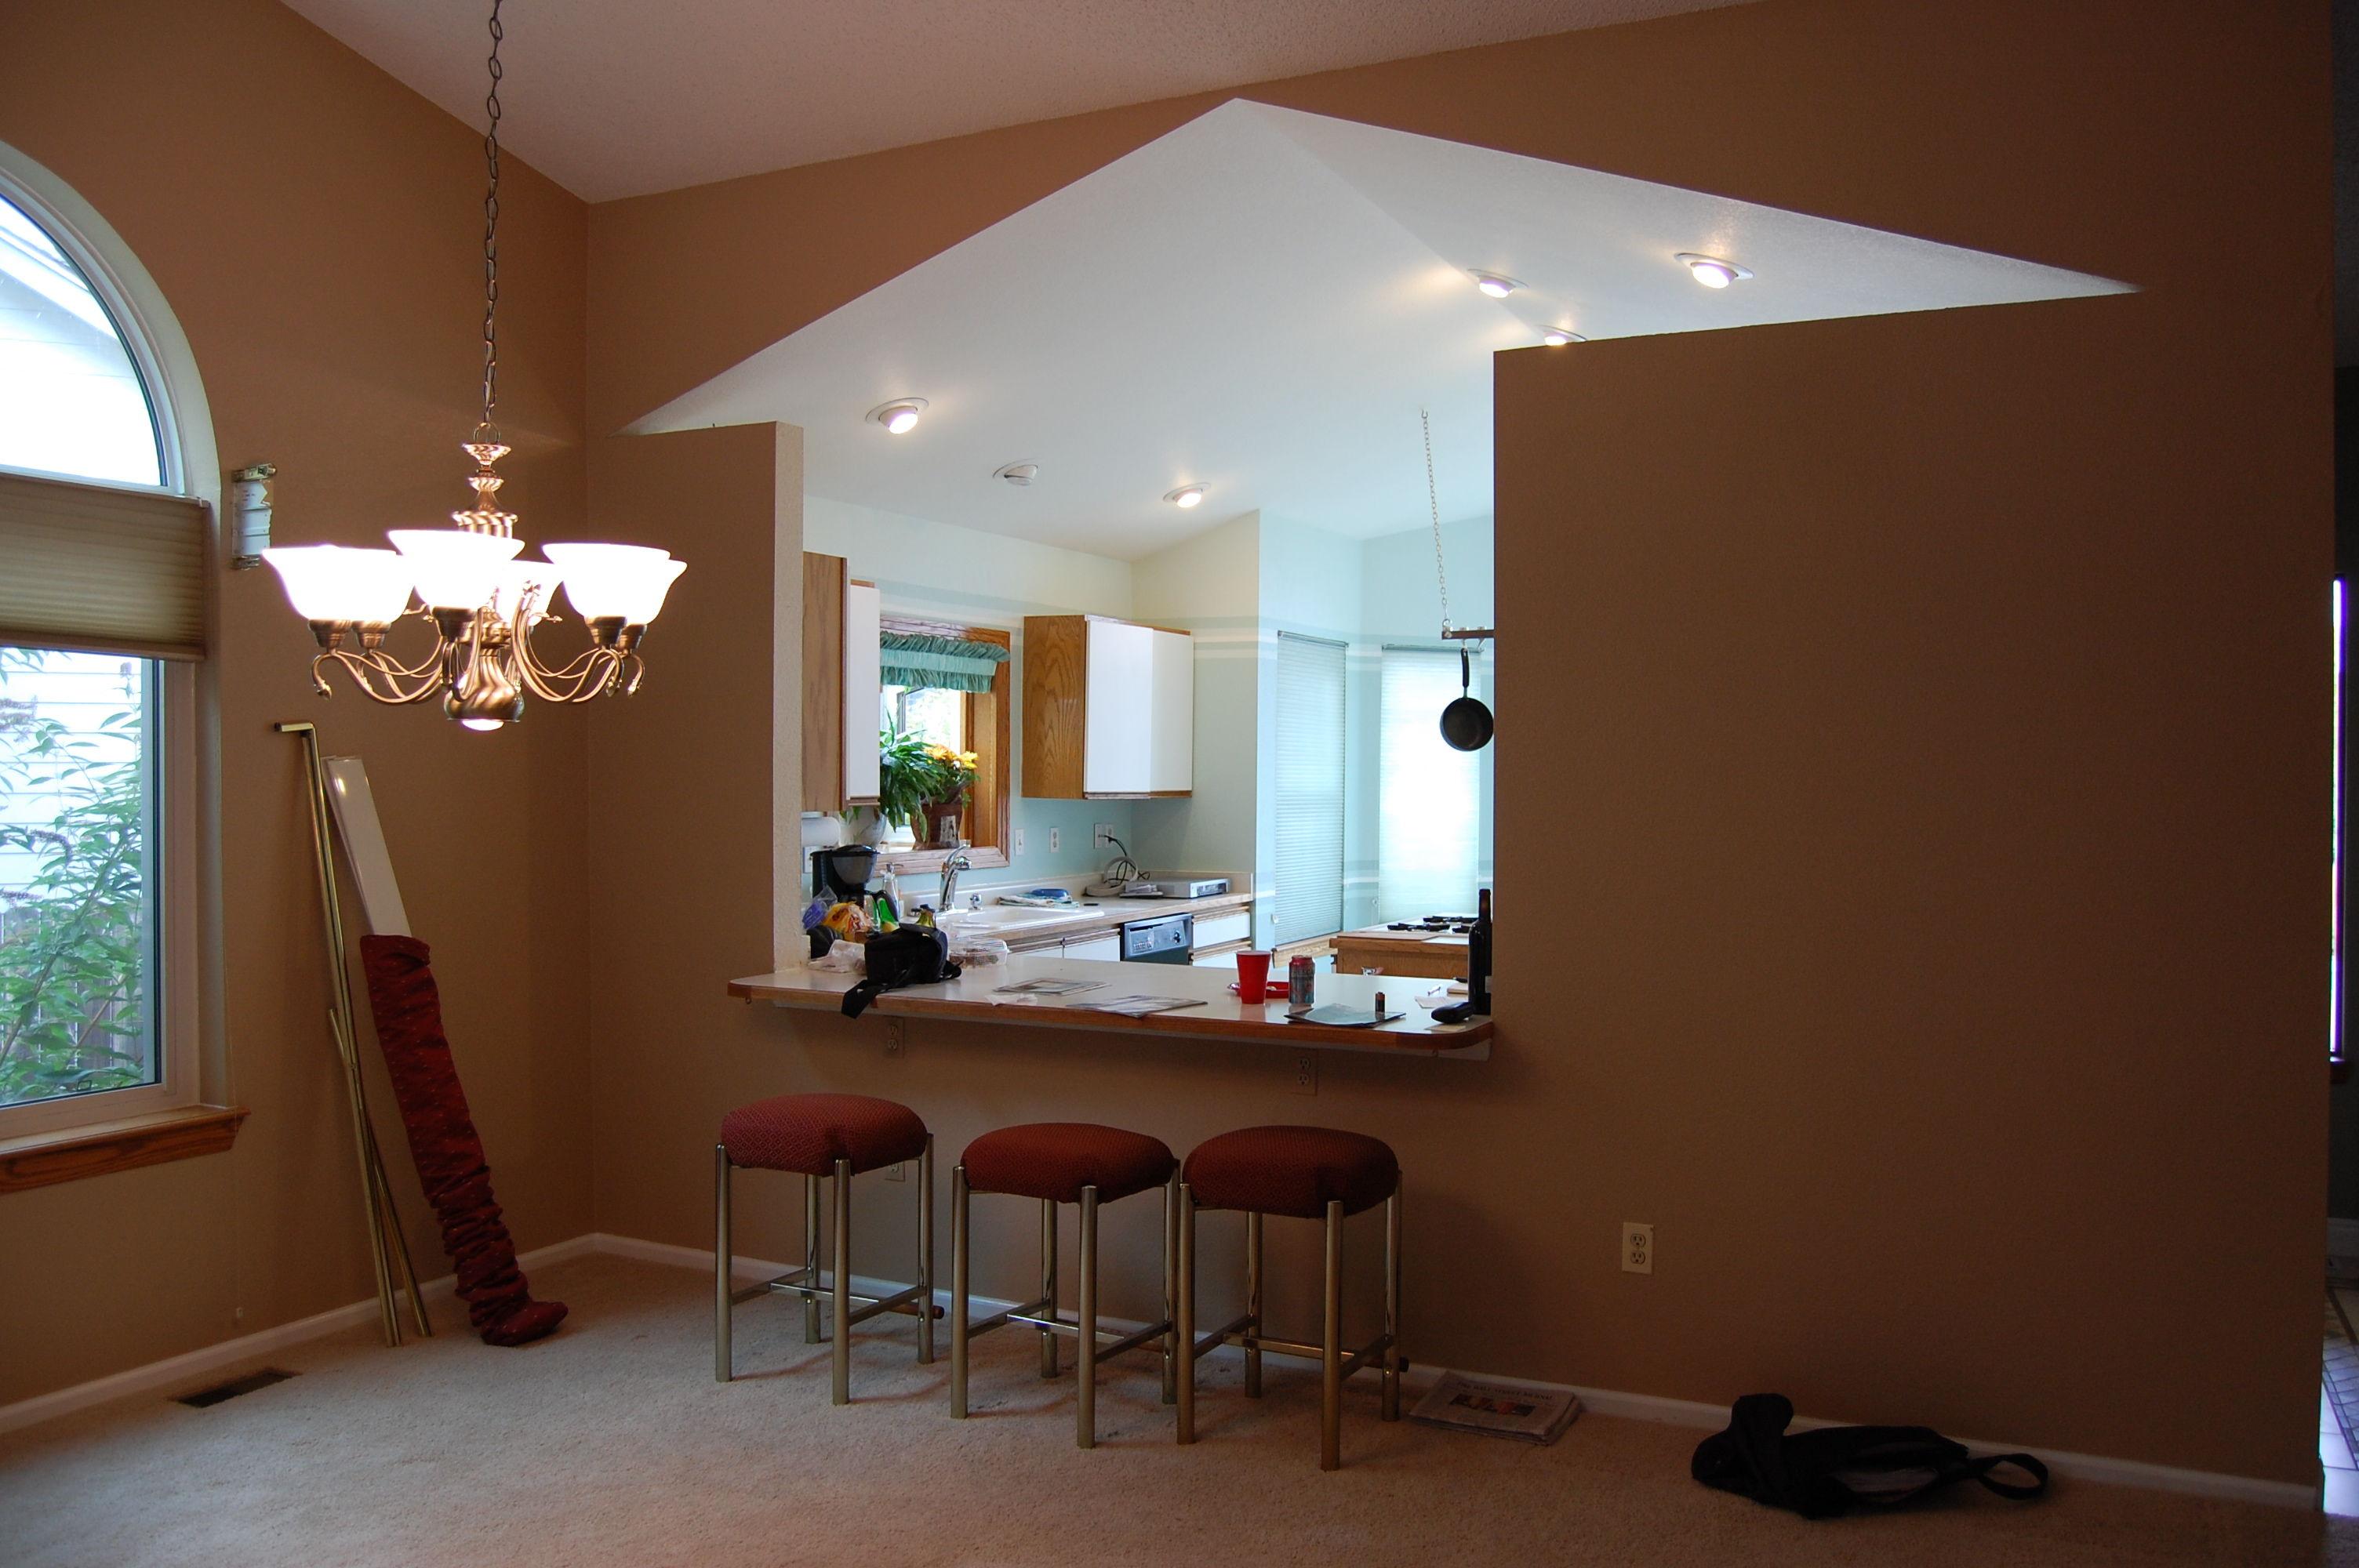 Accolade Drywall LLC image 6